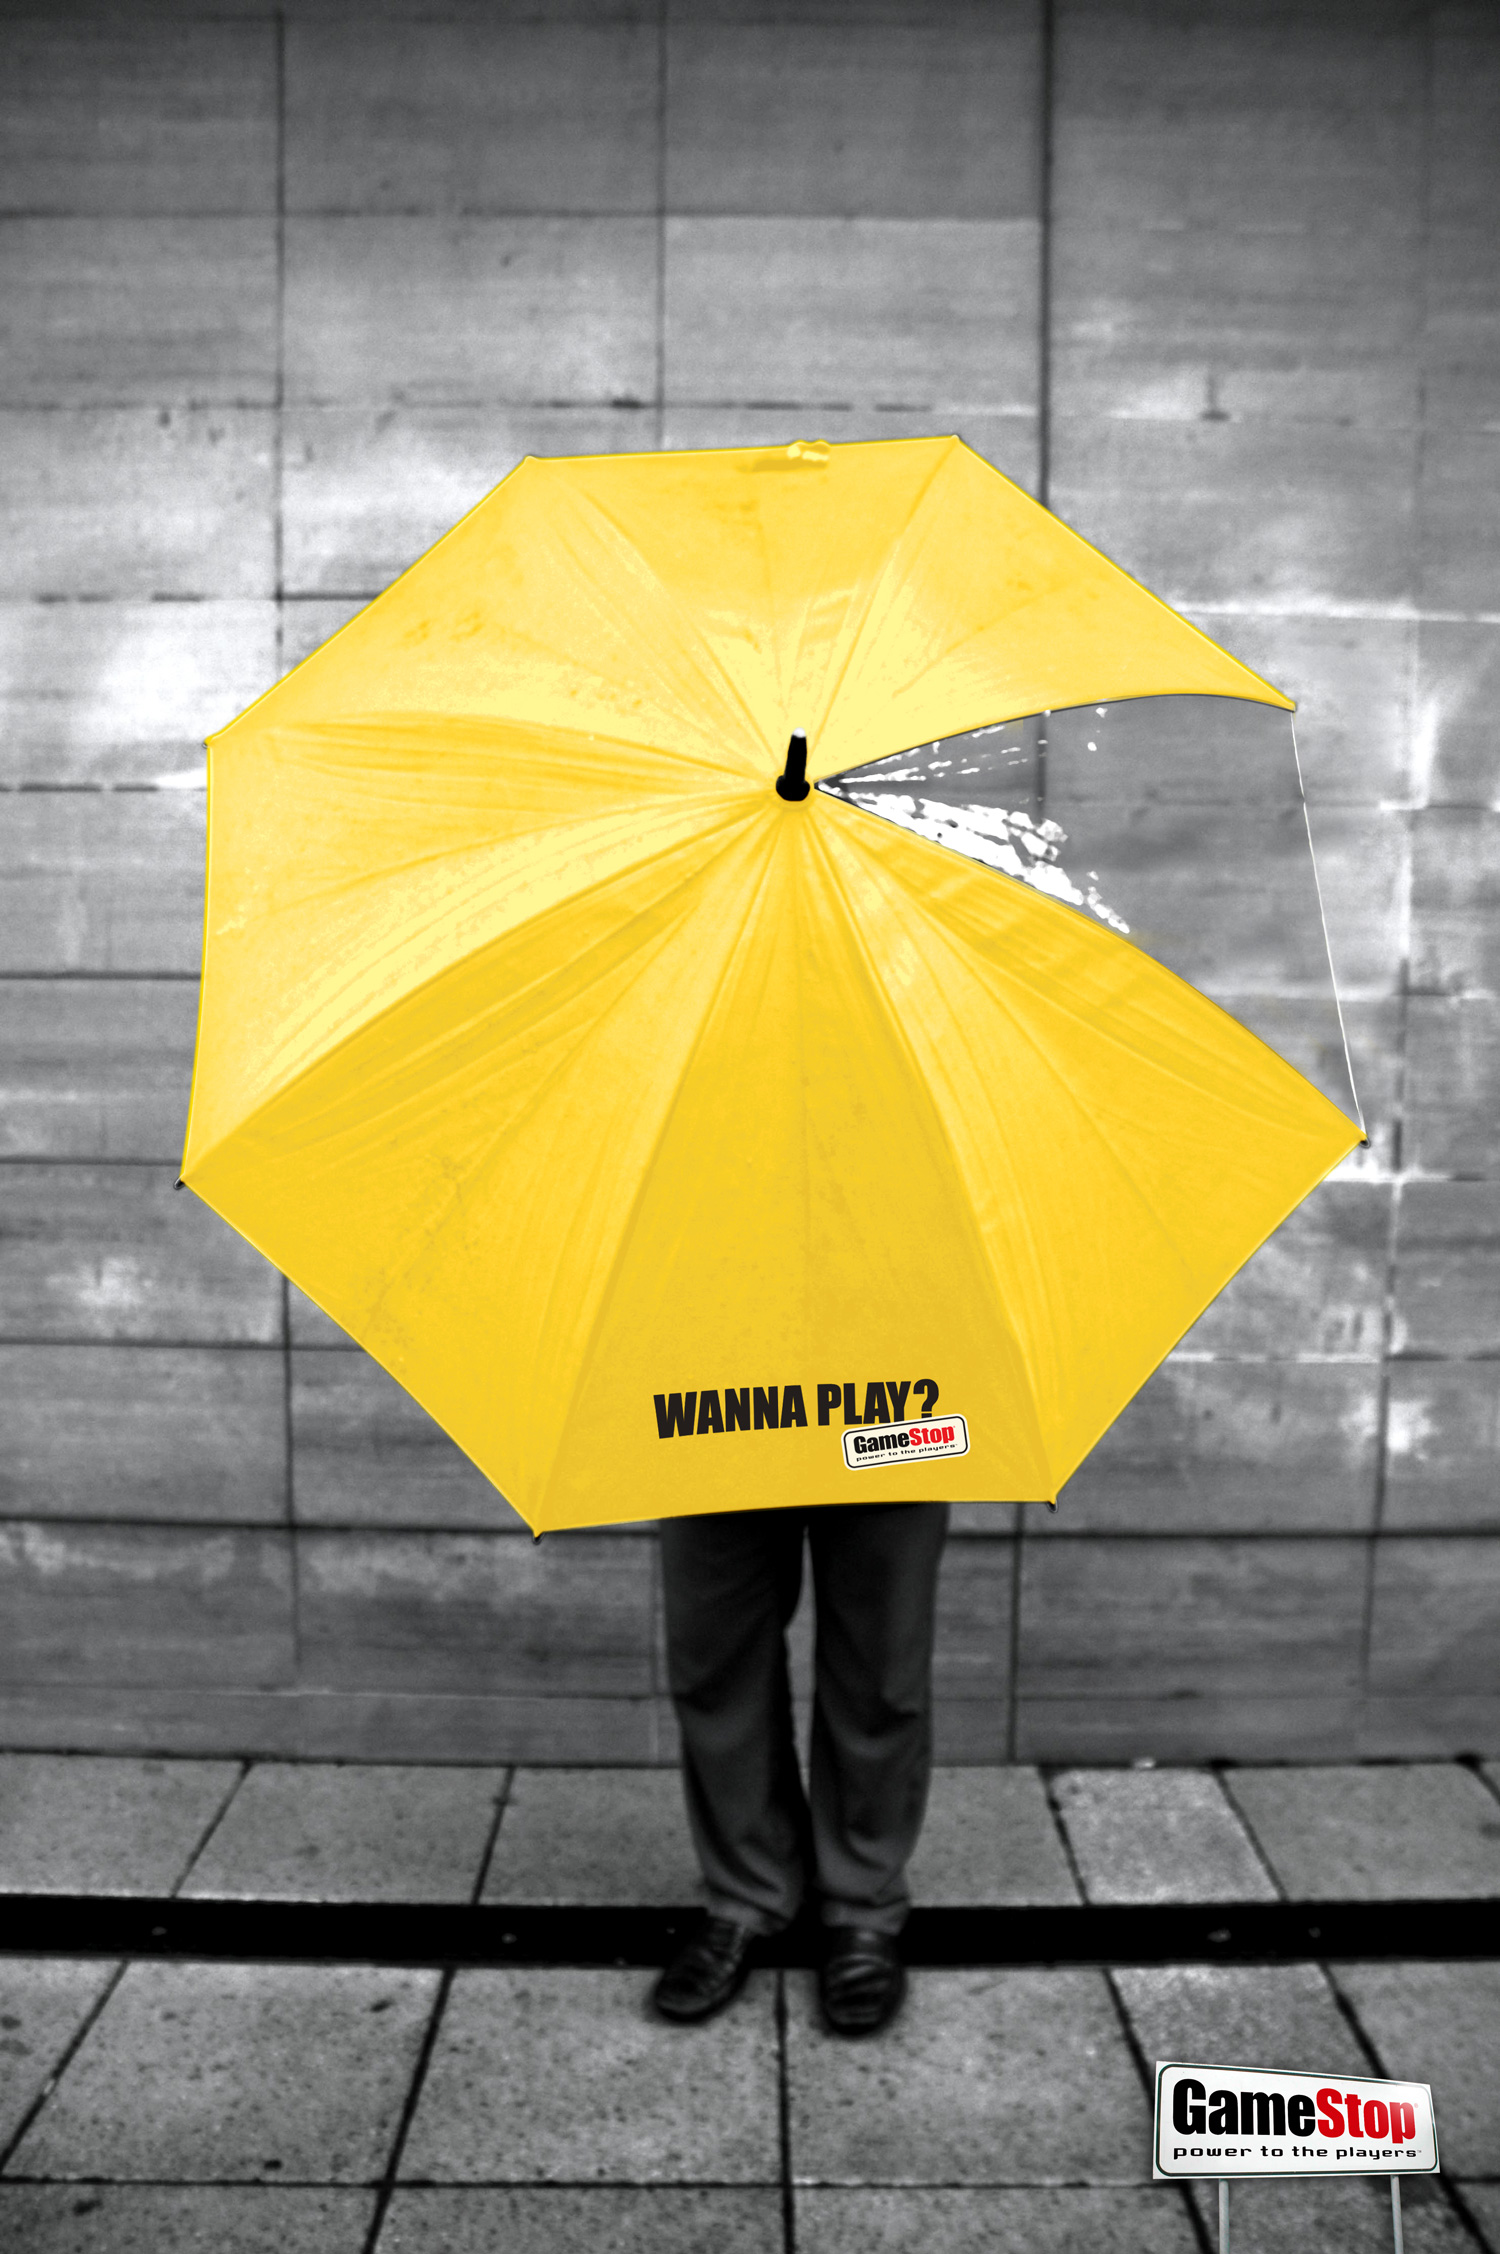 gamestop_umbrella.jpg